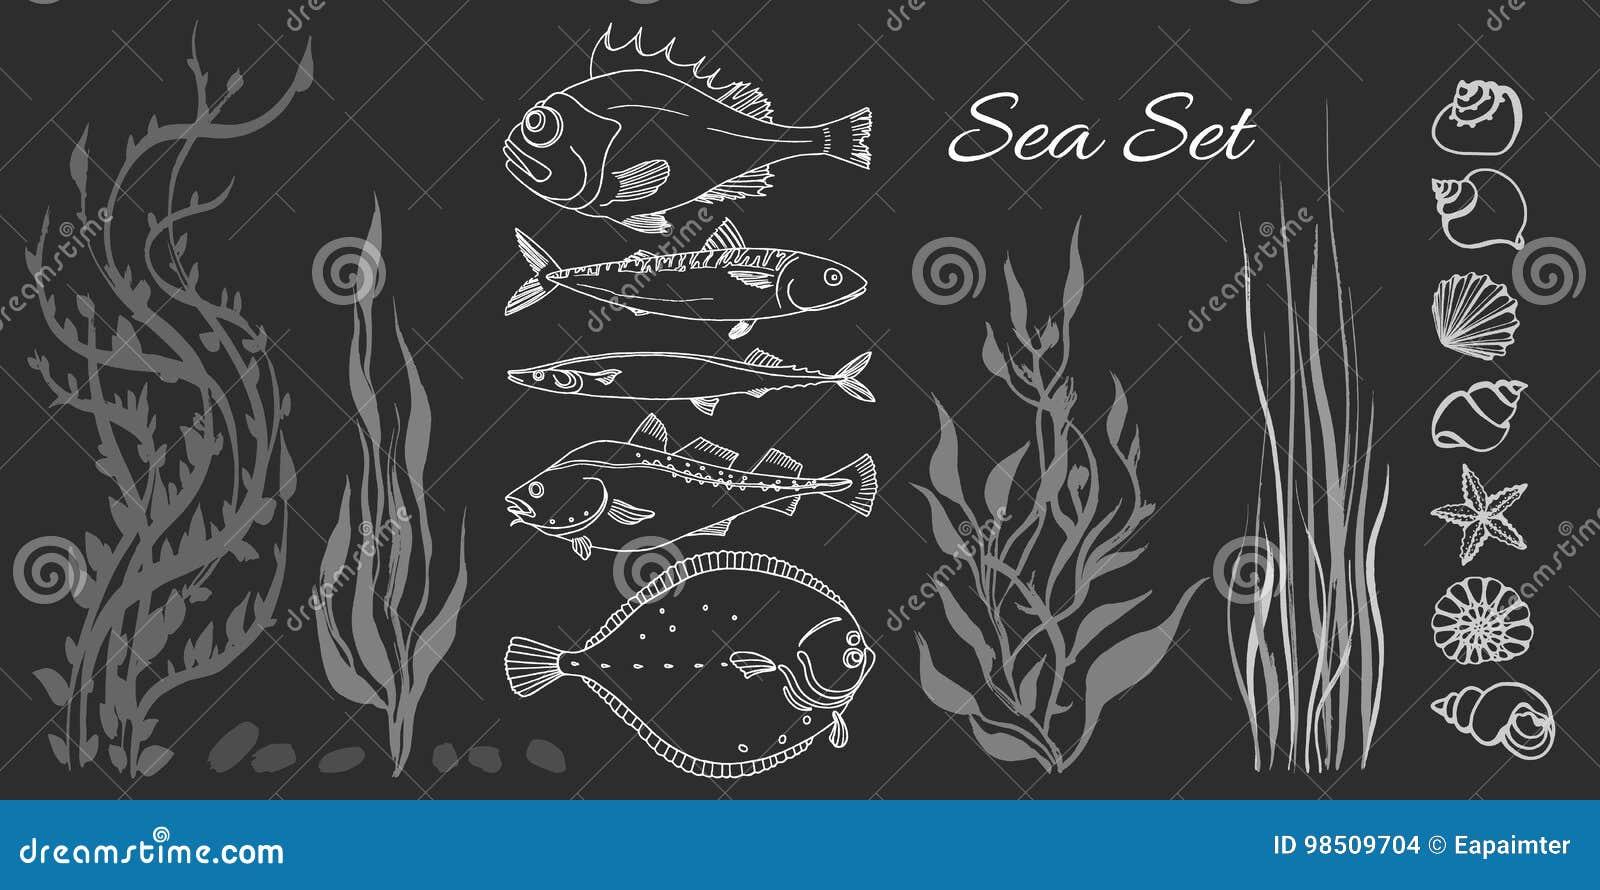 Set of white sea fish, seaweed, seashell. Perch, cod, mackerel, flounder, saira.